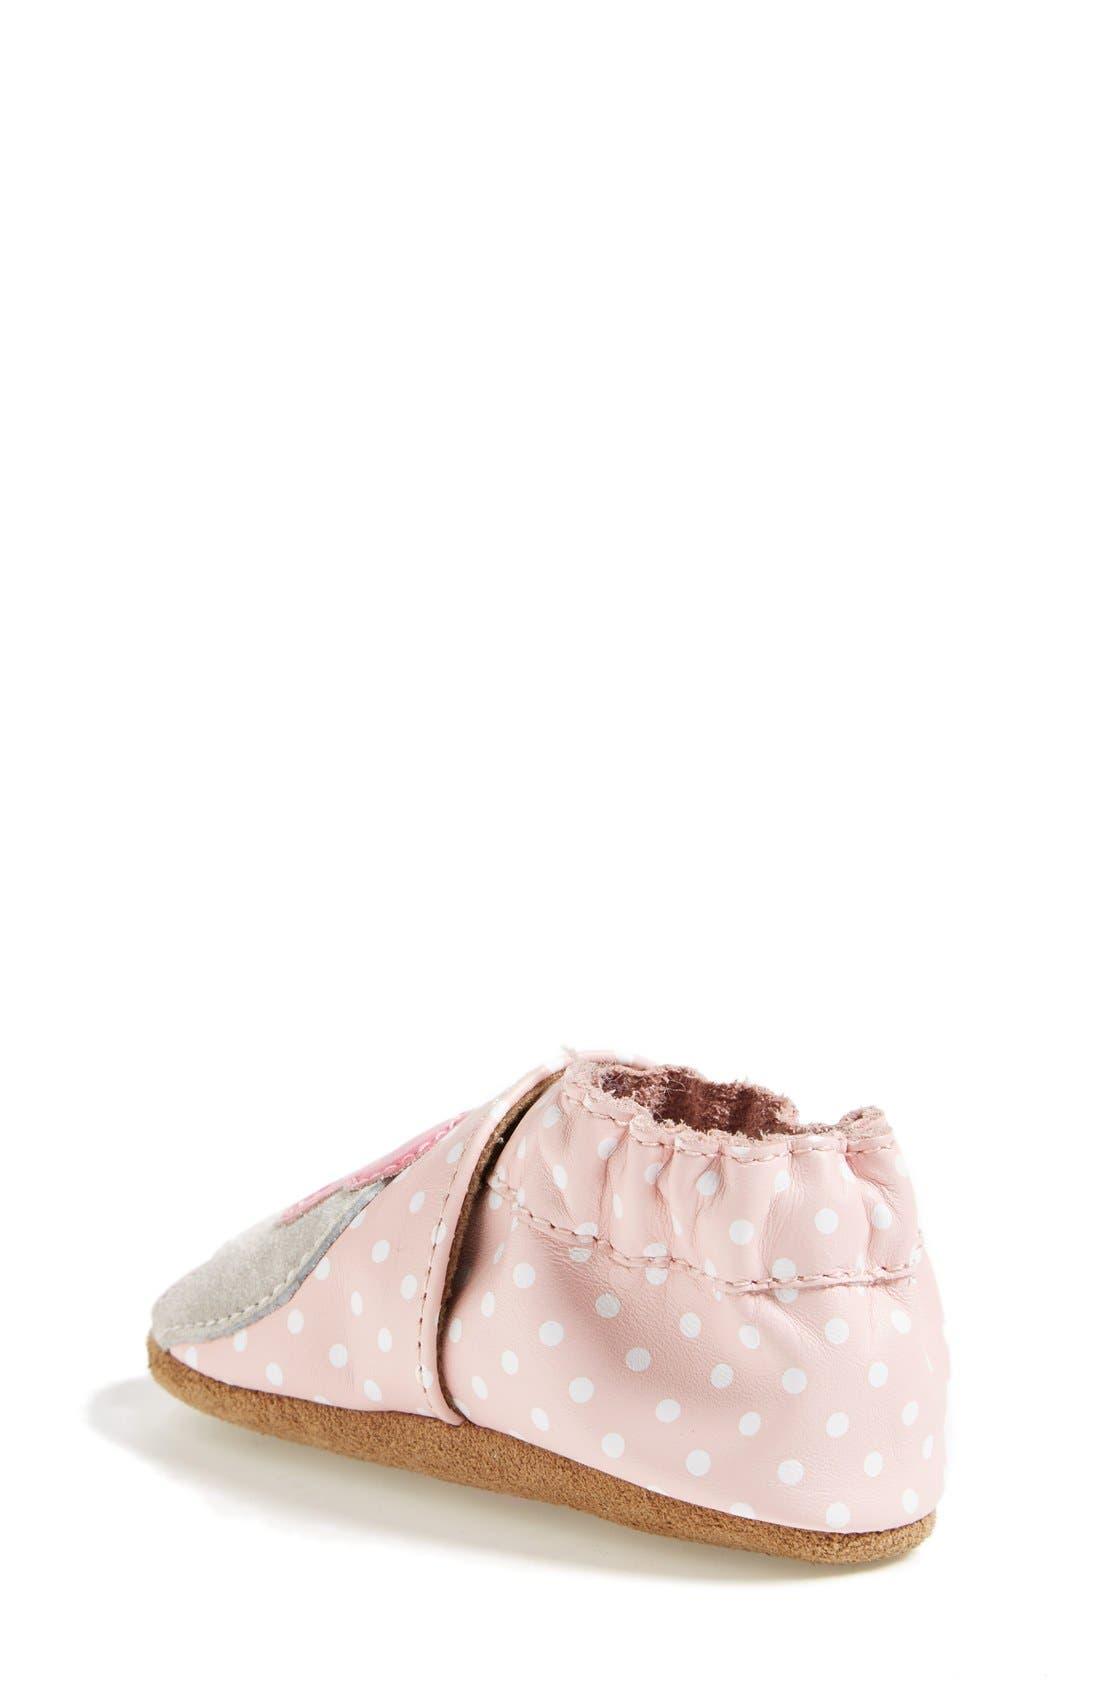 'Little Peanut' Crib Shoe,                             Alternate thumbnail 2, color,                             PASTEL PINK